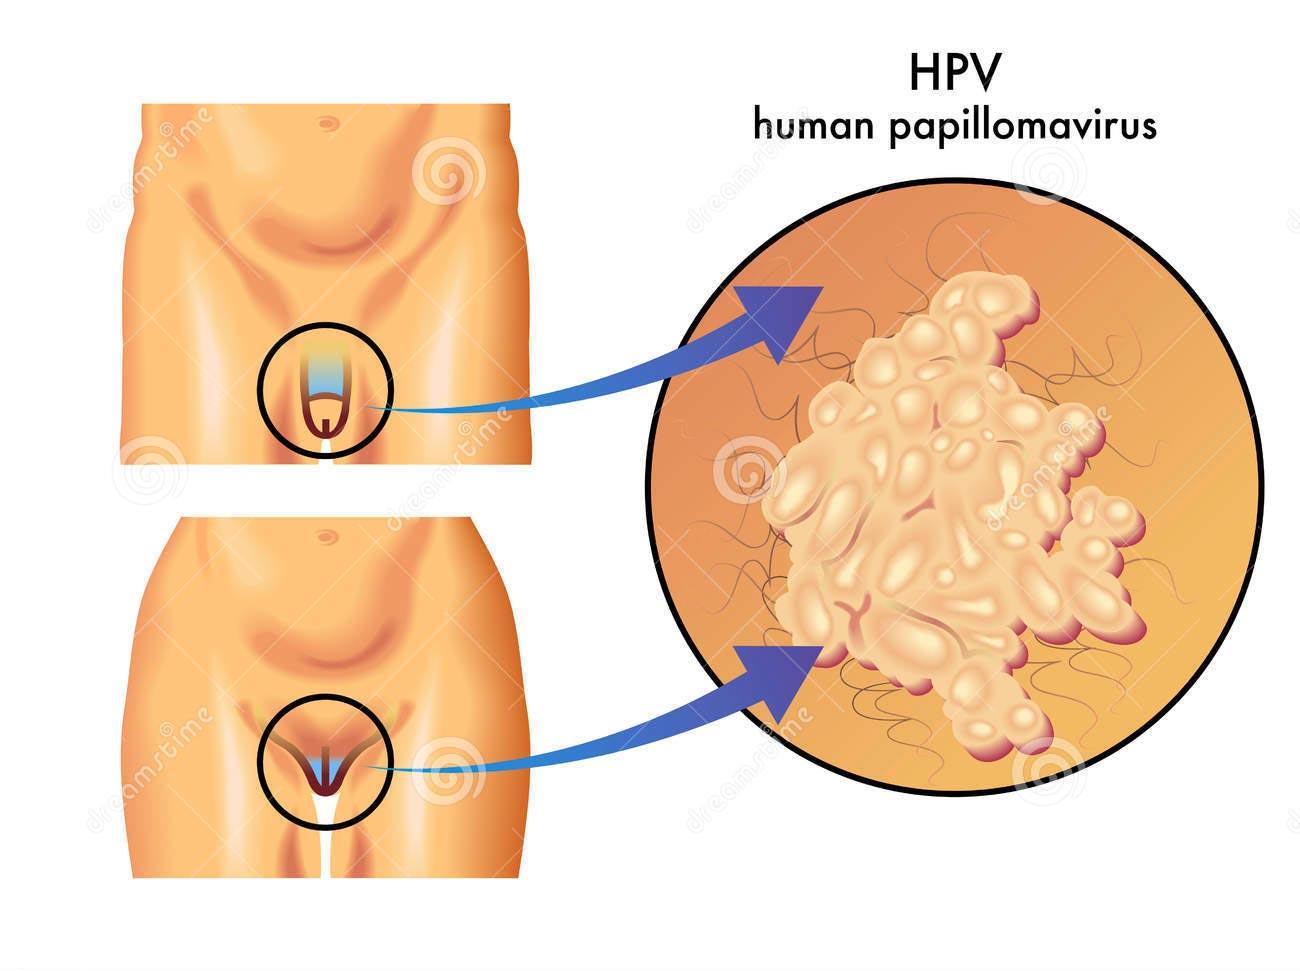 Human papillomavirus vaccine trial